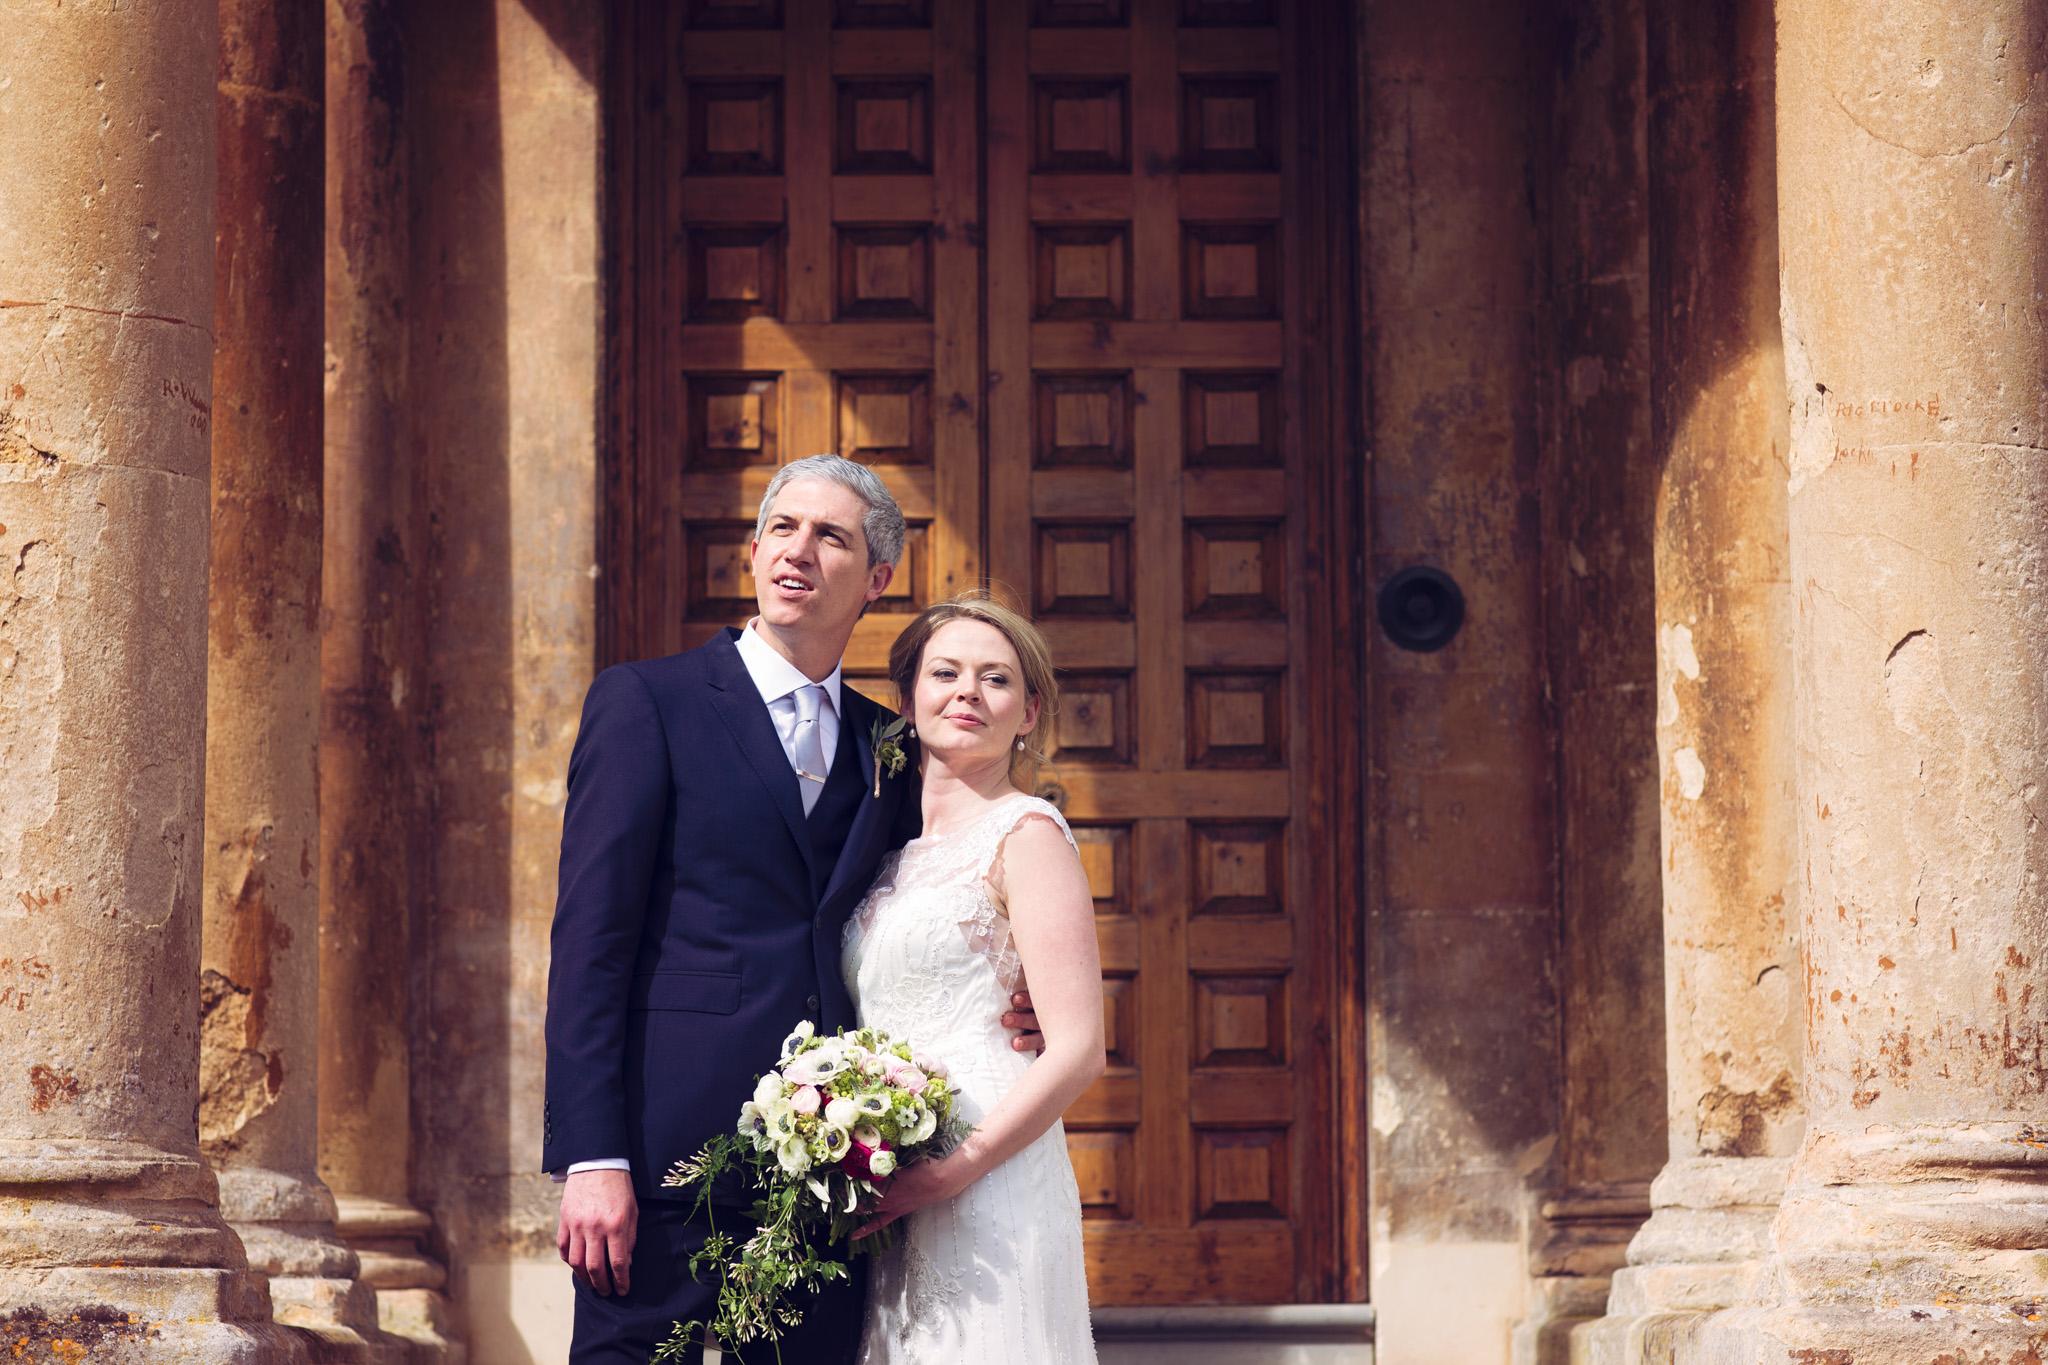 Mark_Barnes_Gloucester_Wedding_Photographer_Elmore_Court_Wedding_Photography_Mike+Kelly-72.jpg